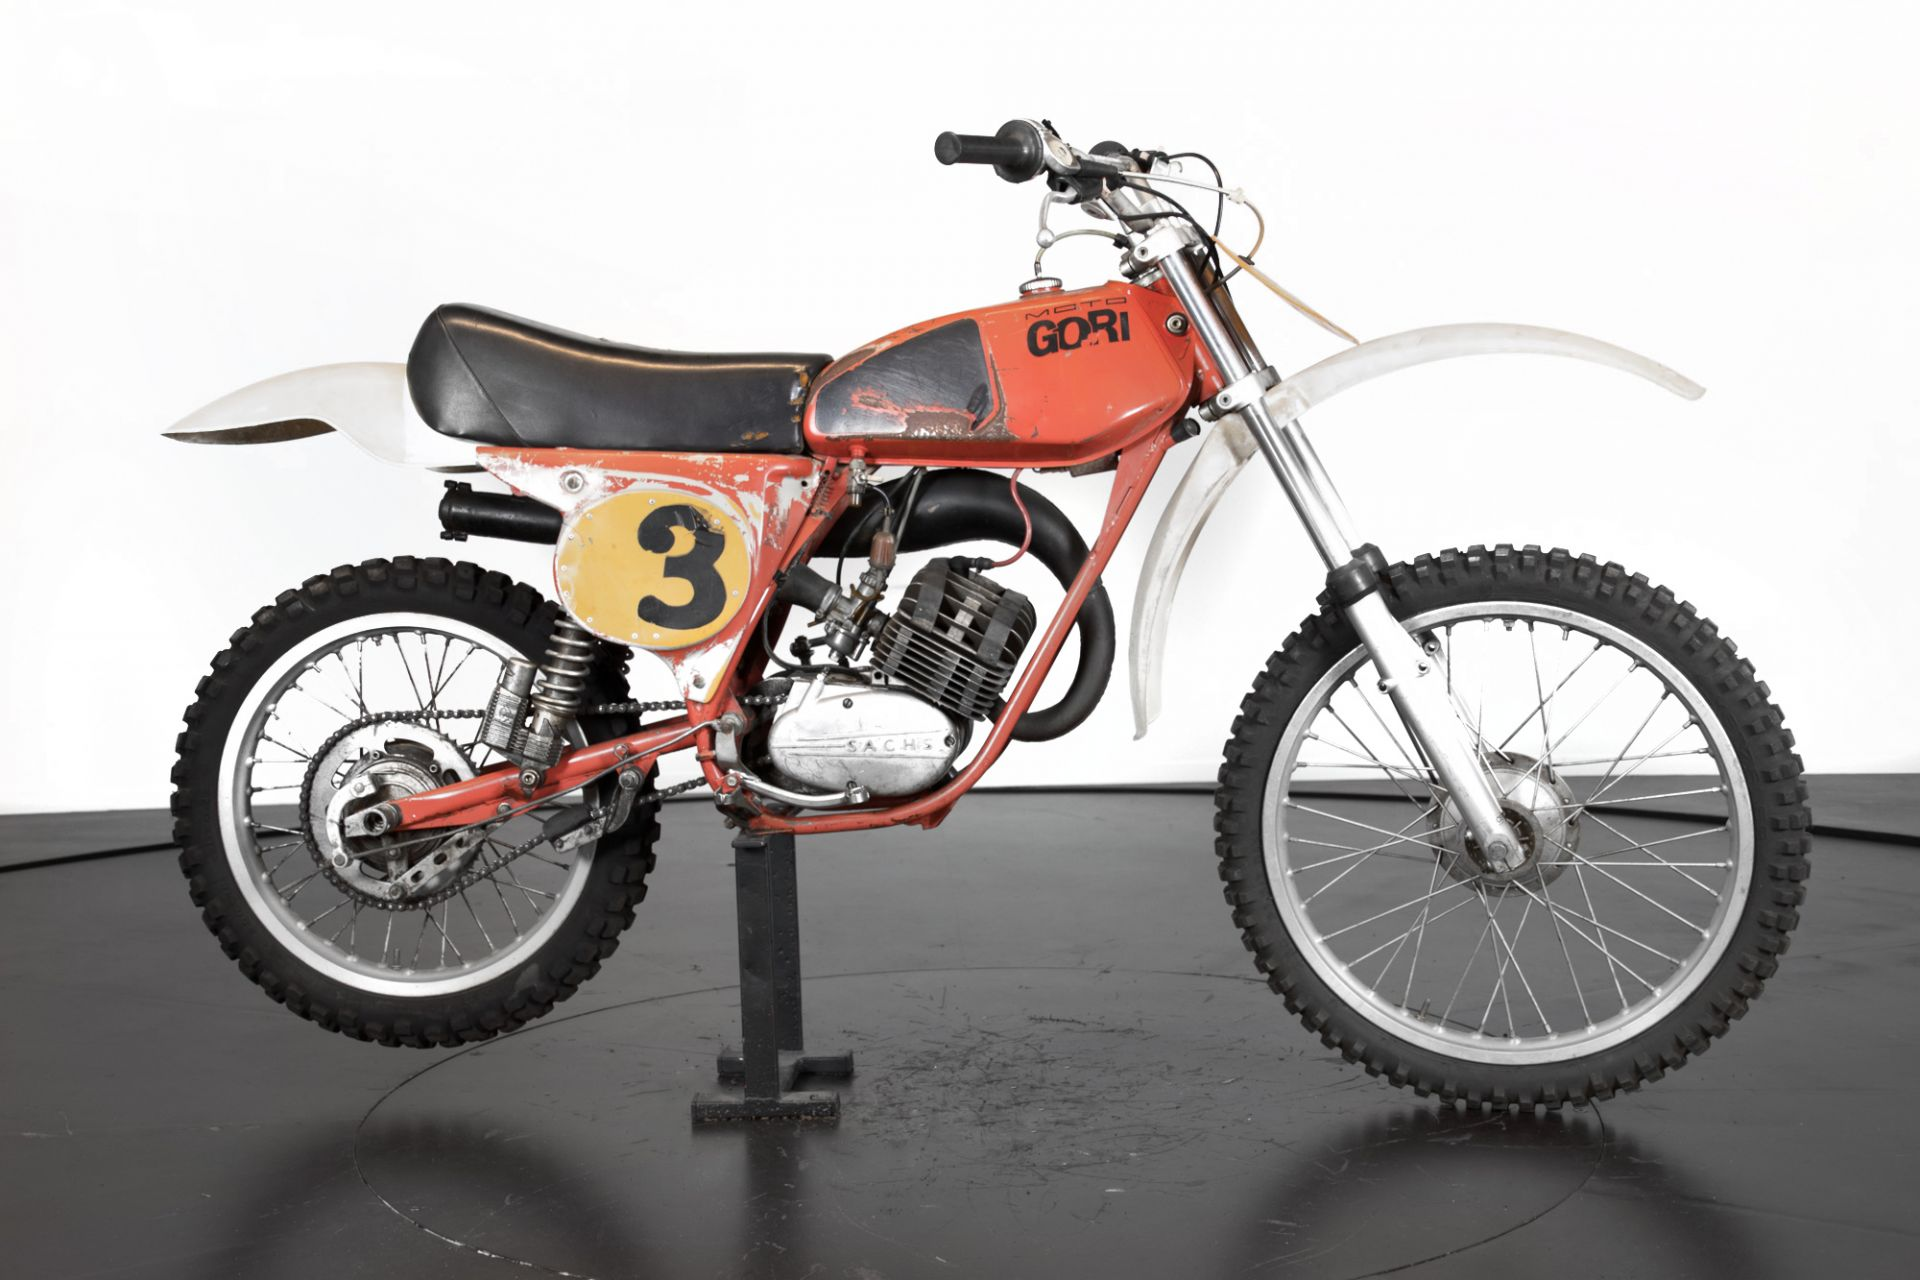 1977 Gori Cross 50 35494